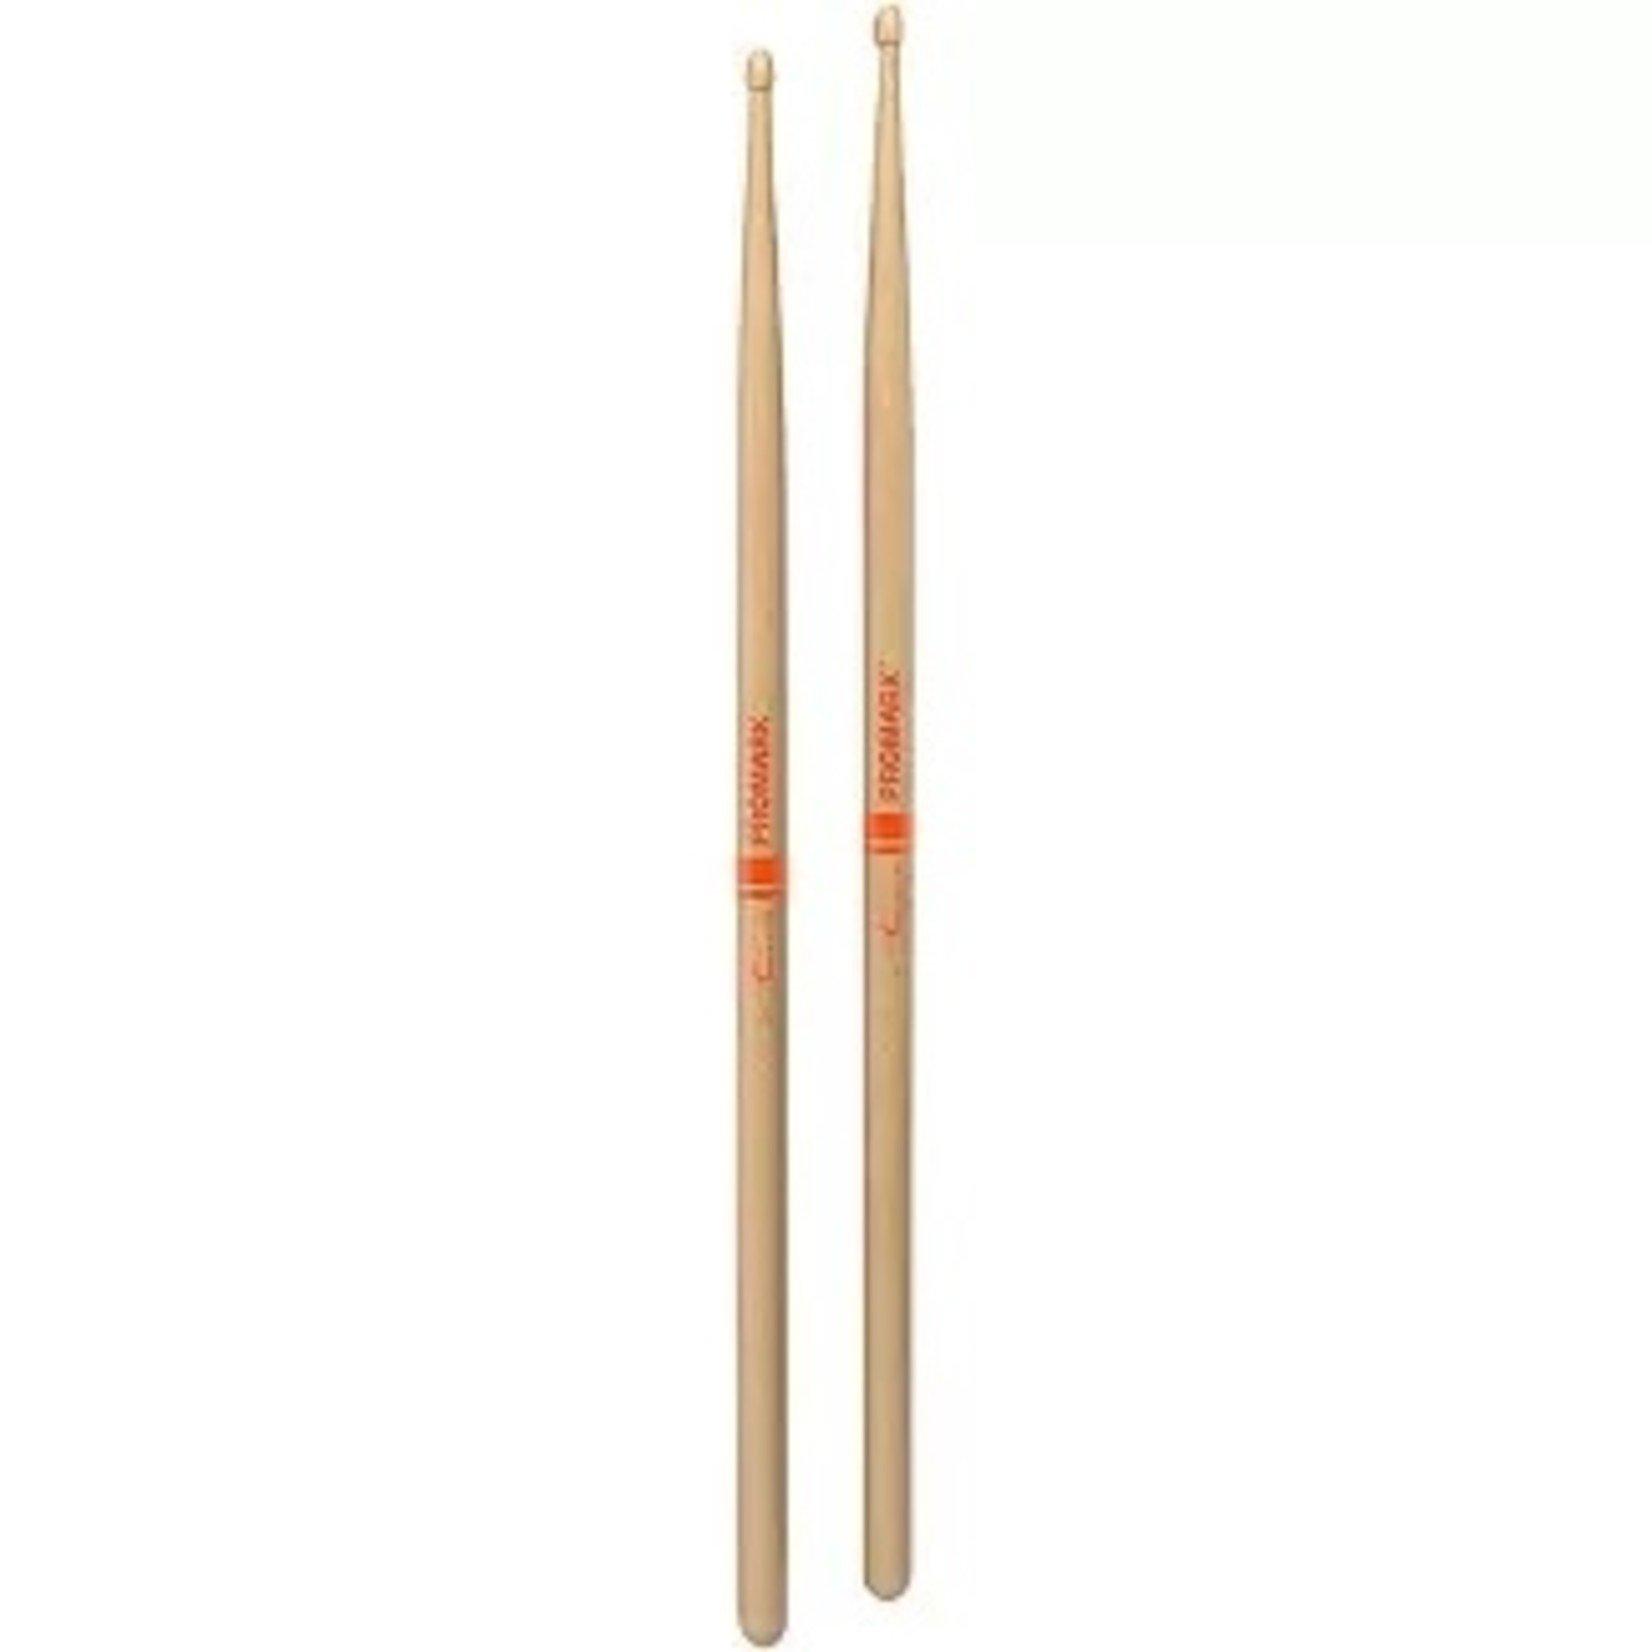 Promark ProMark Anika Nilles Hickory Wood Tip Drumsticks